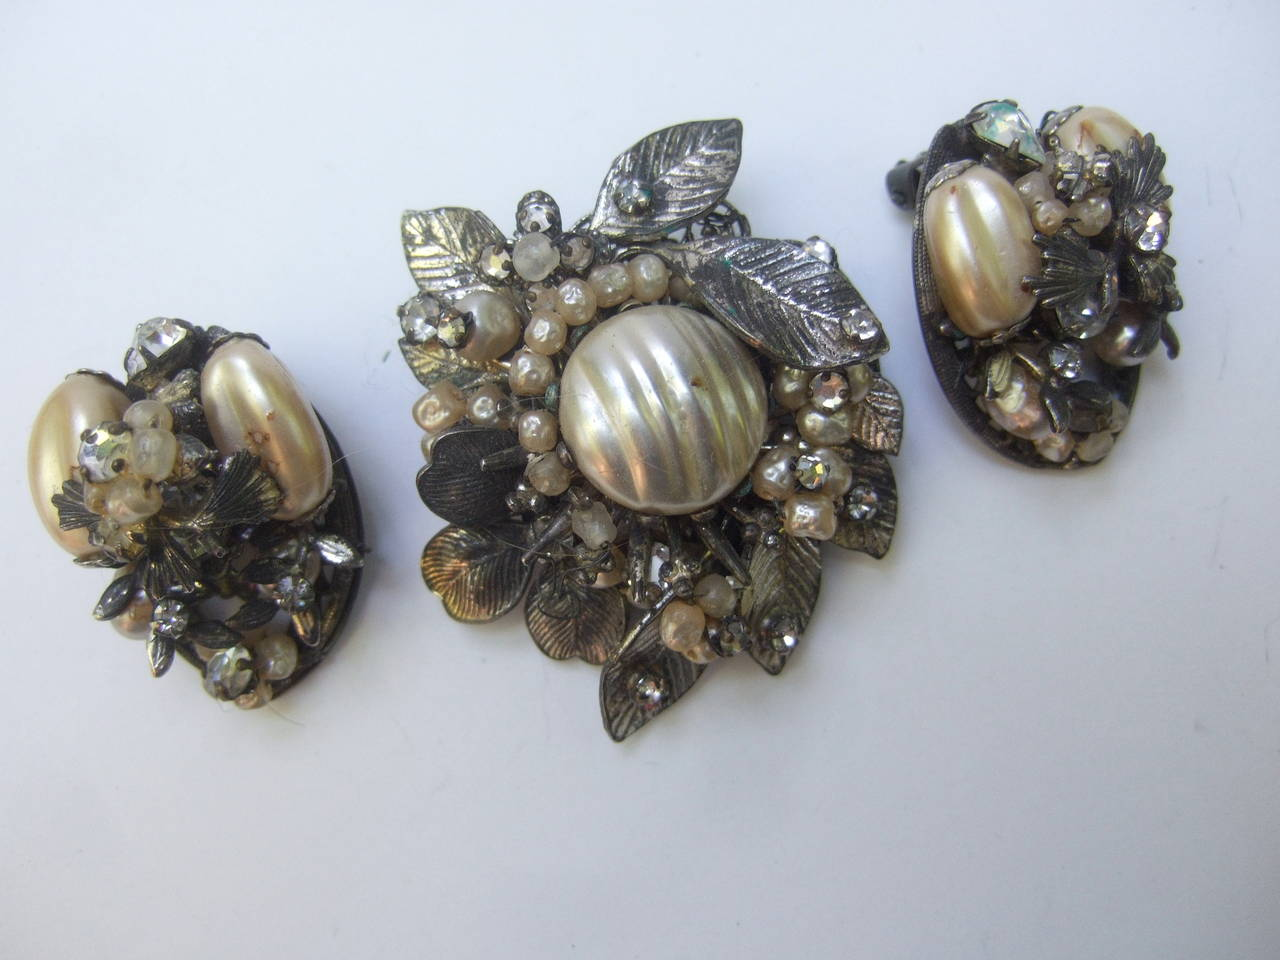 1950s Costume Pearl Brooch, Bracelet & Earrings by Robert For Sale 2